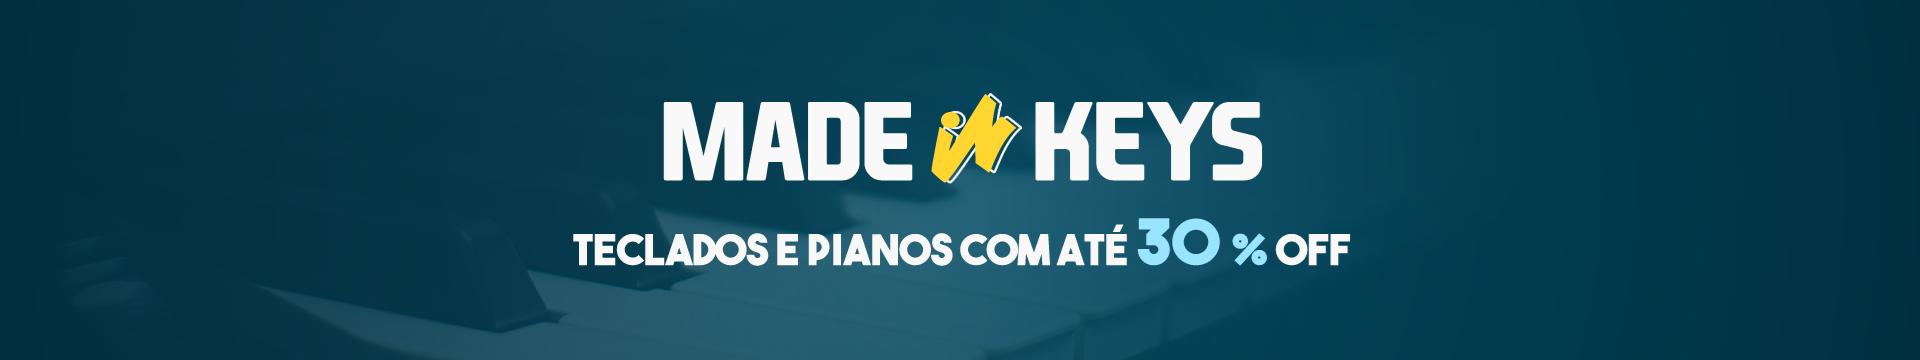 Made in Keys